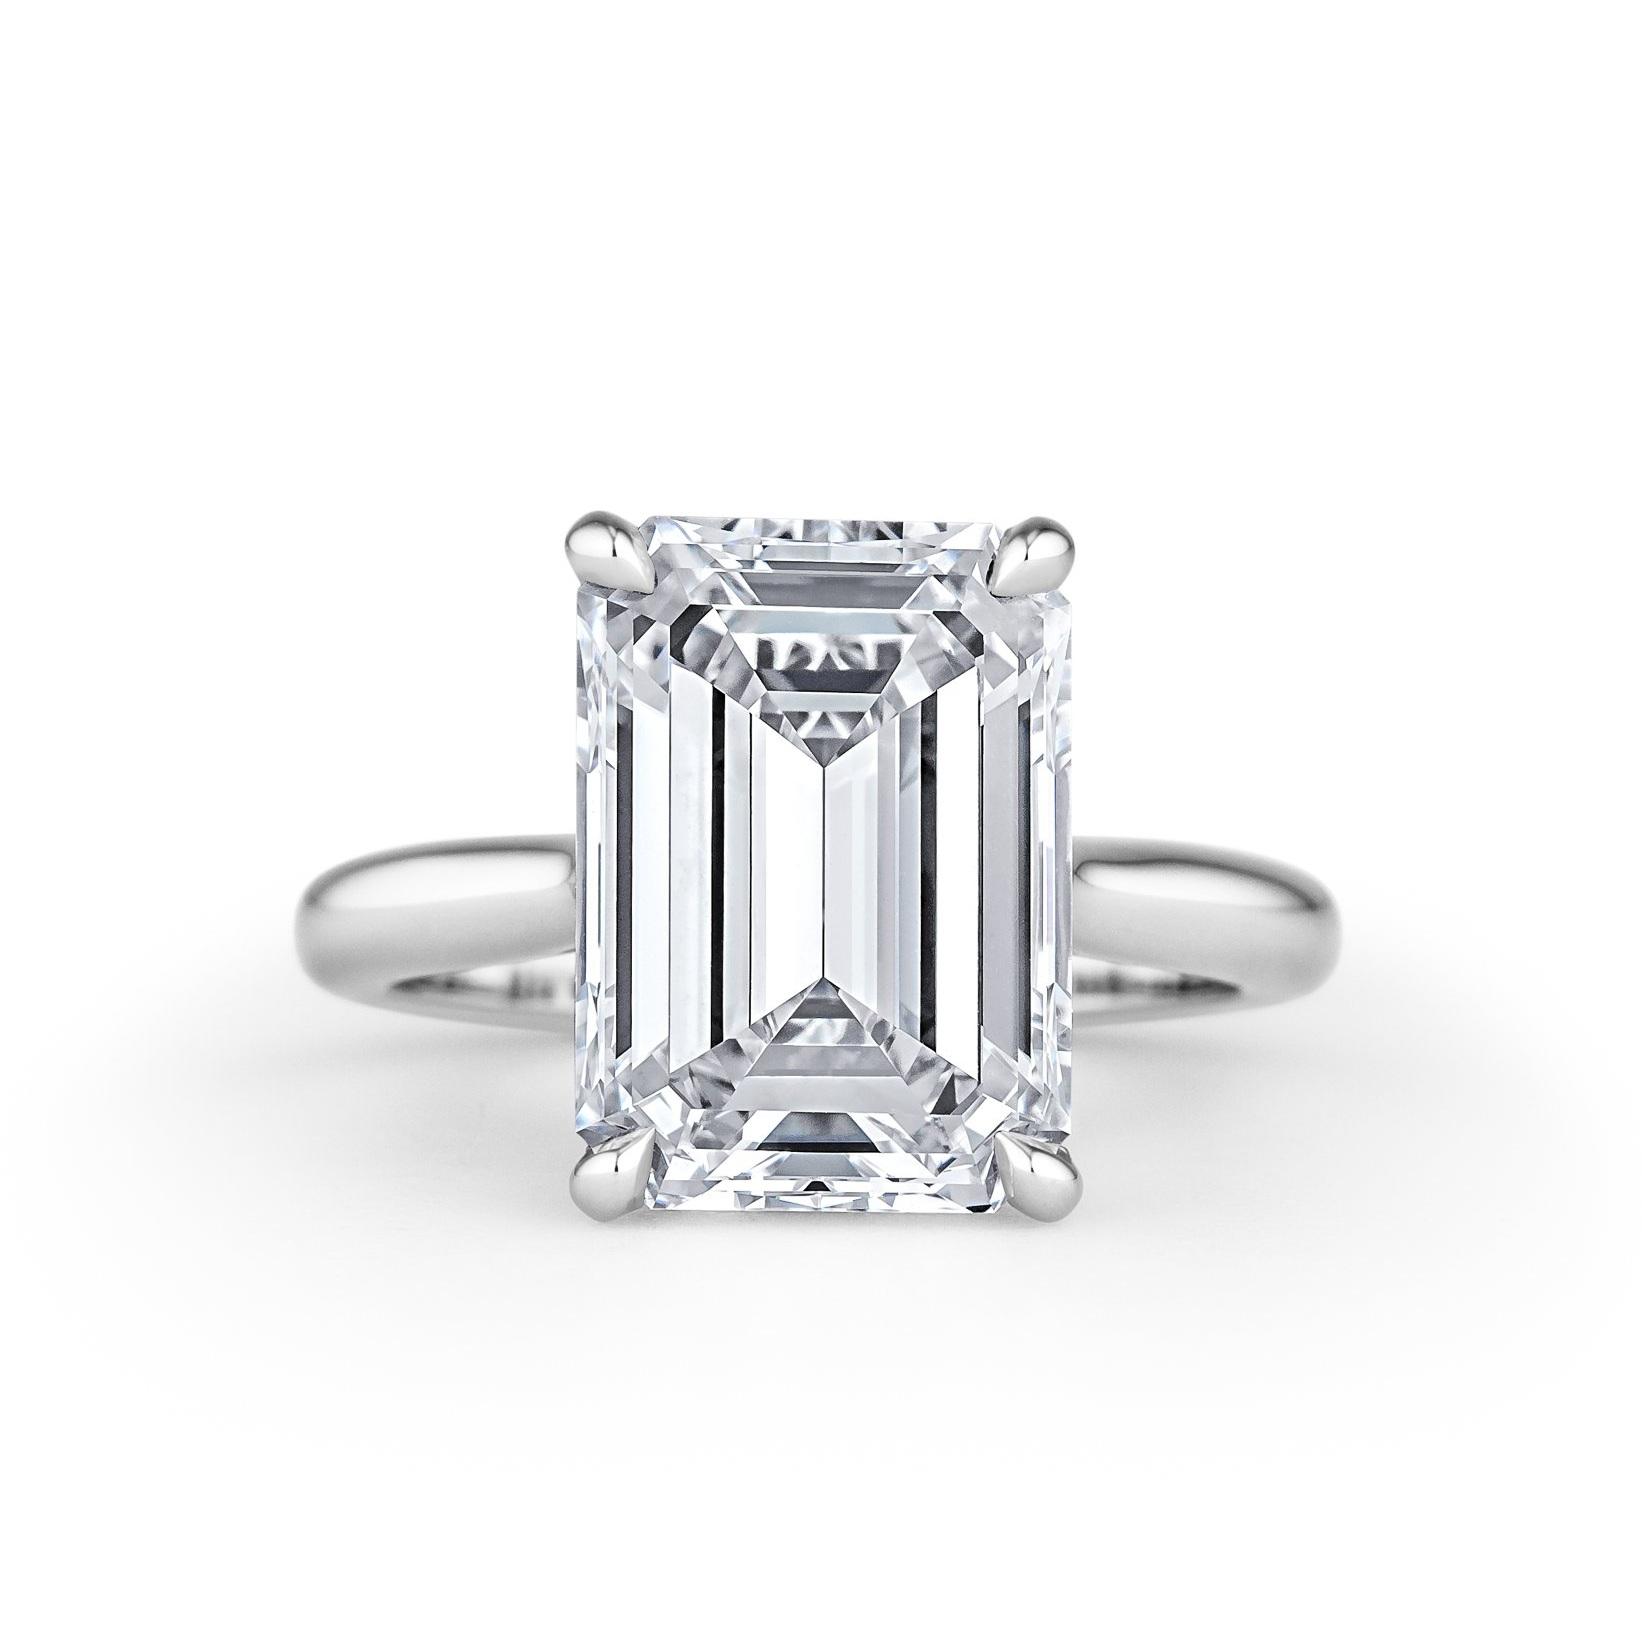 Cut Emerald Diamond 6 Platinum Ring 41 Carat Engagement FcKTl1J